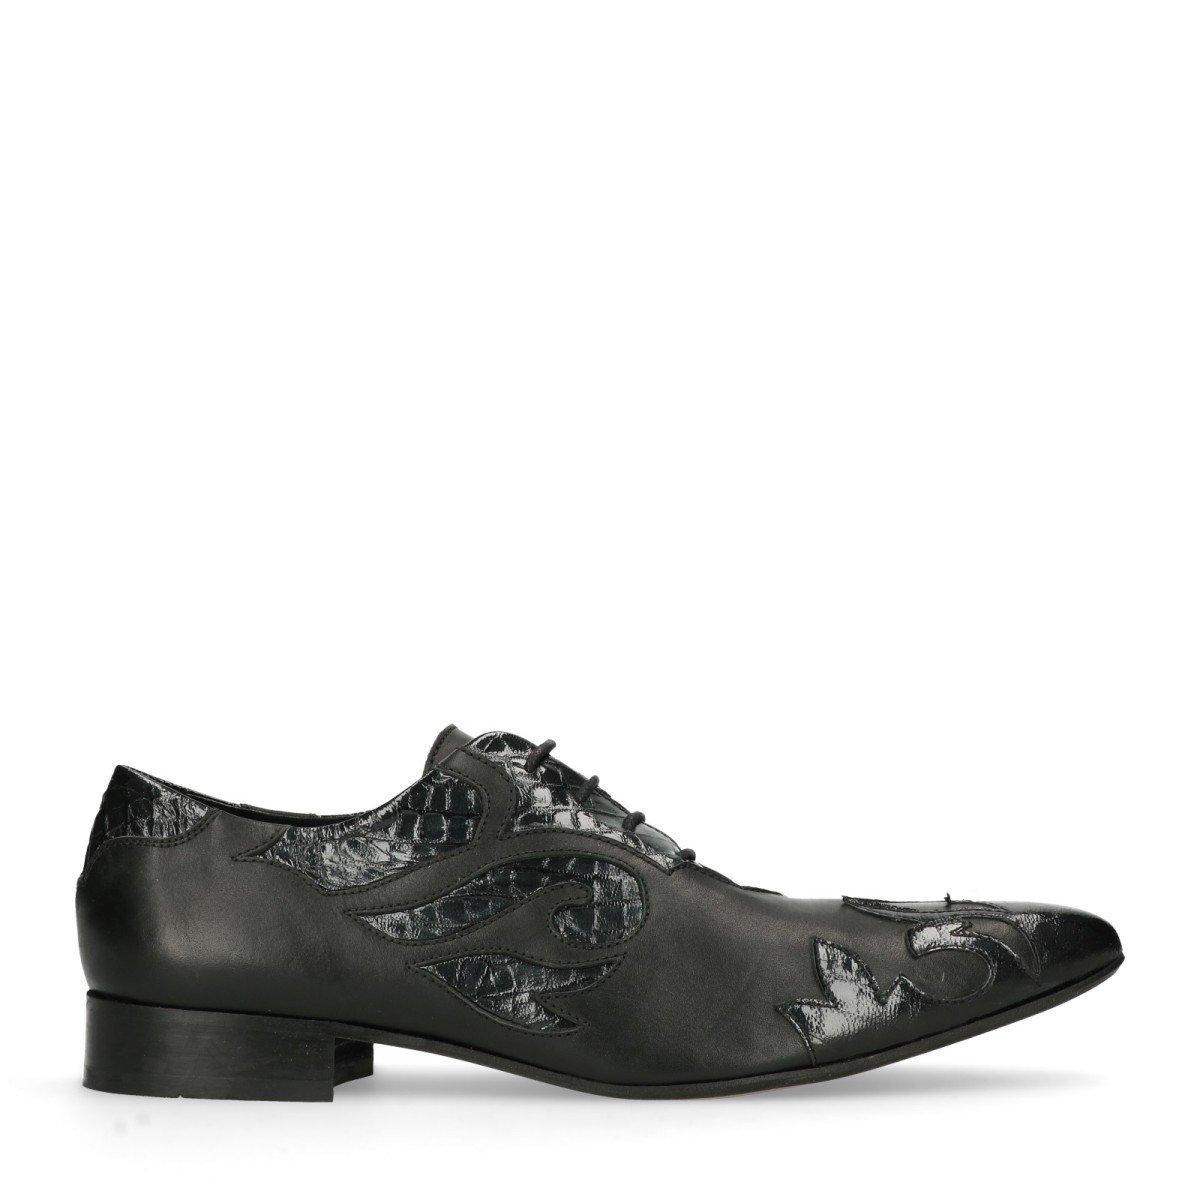 buy popular 81008 9a8a7 Schnürer Oxford Herren Schuhe Sacha Rot Farbe Leder ...